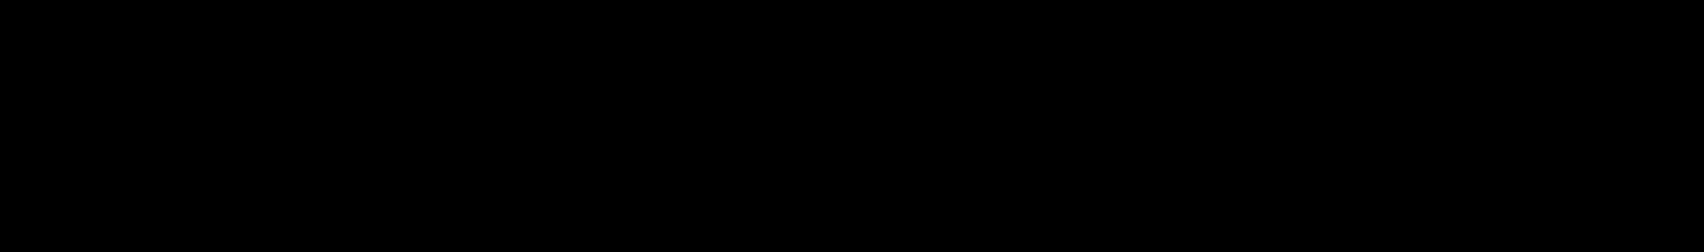 Wordpress Webdesign Tool Logo